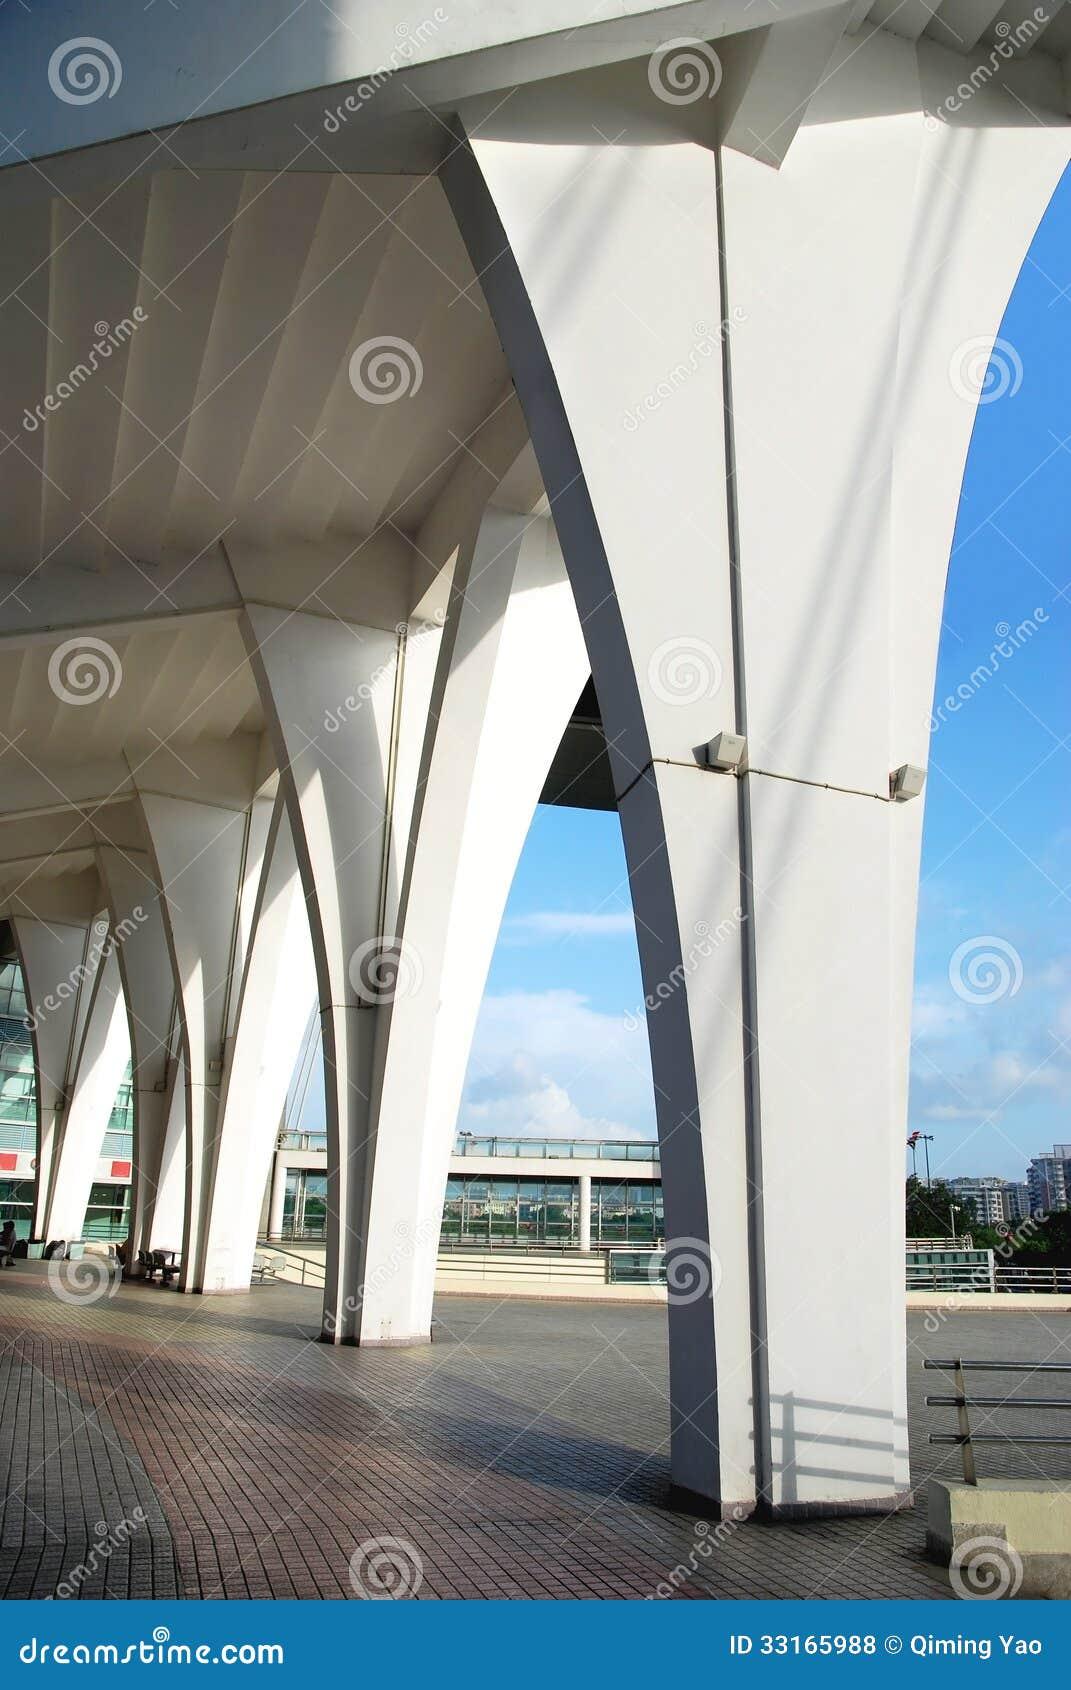 Pillar of stadium